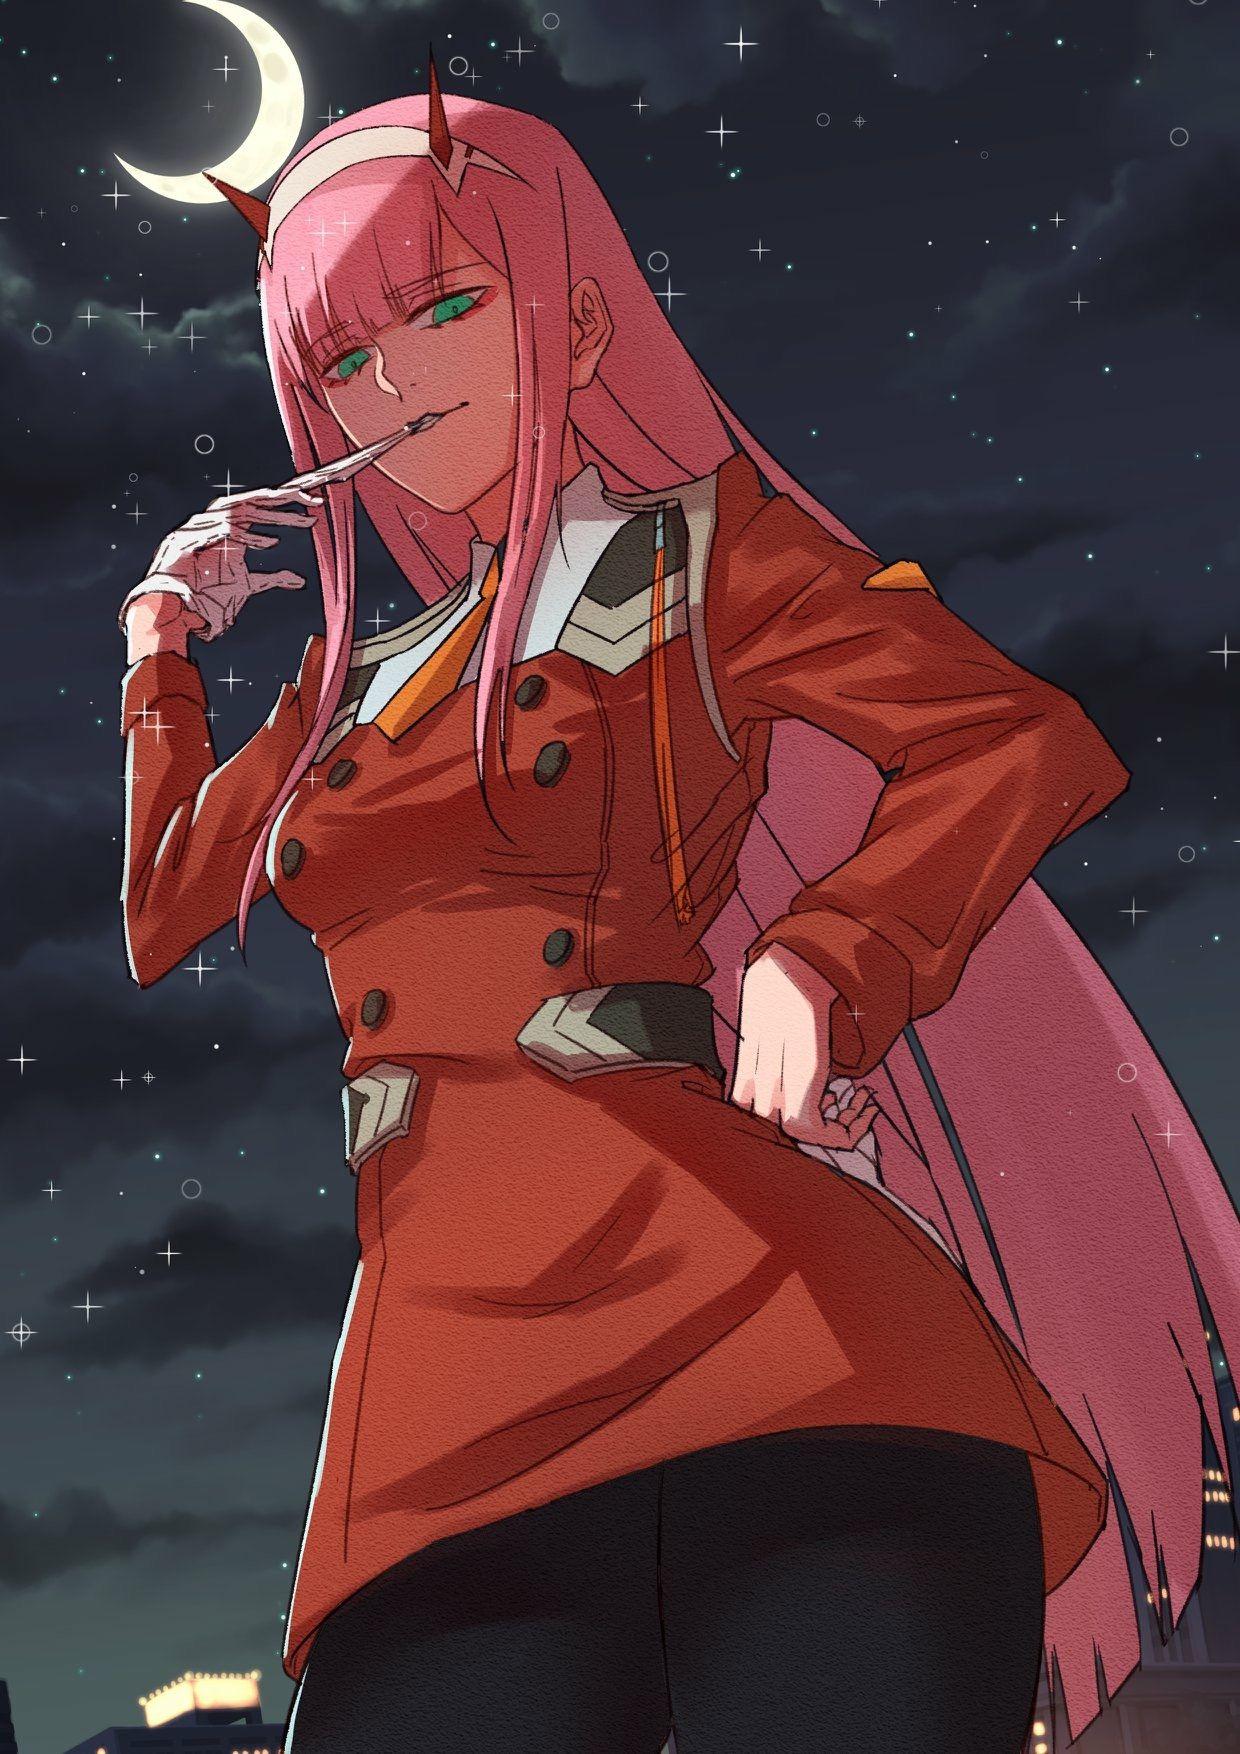 Pin em Anime art II